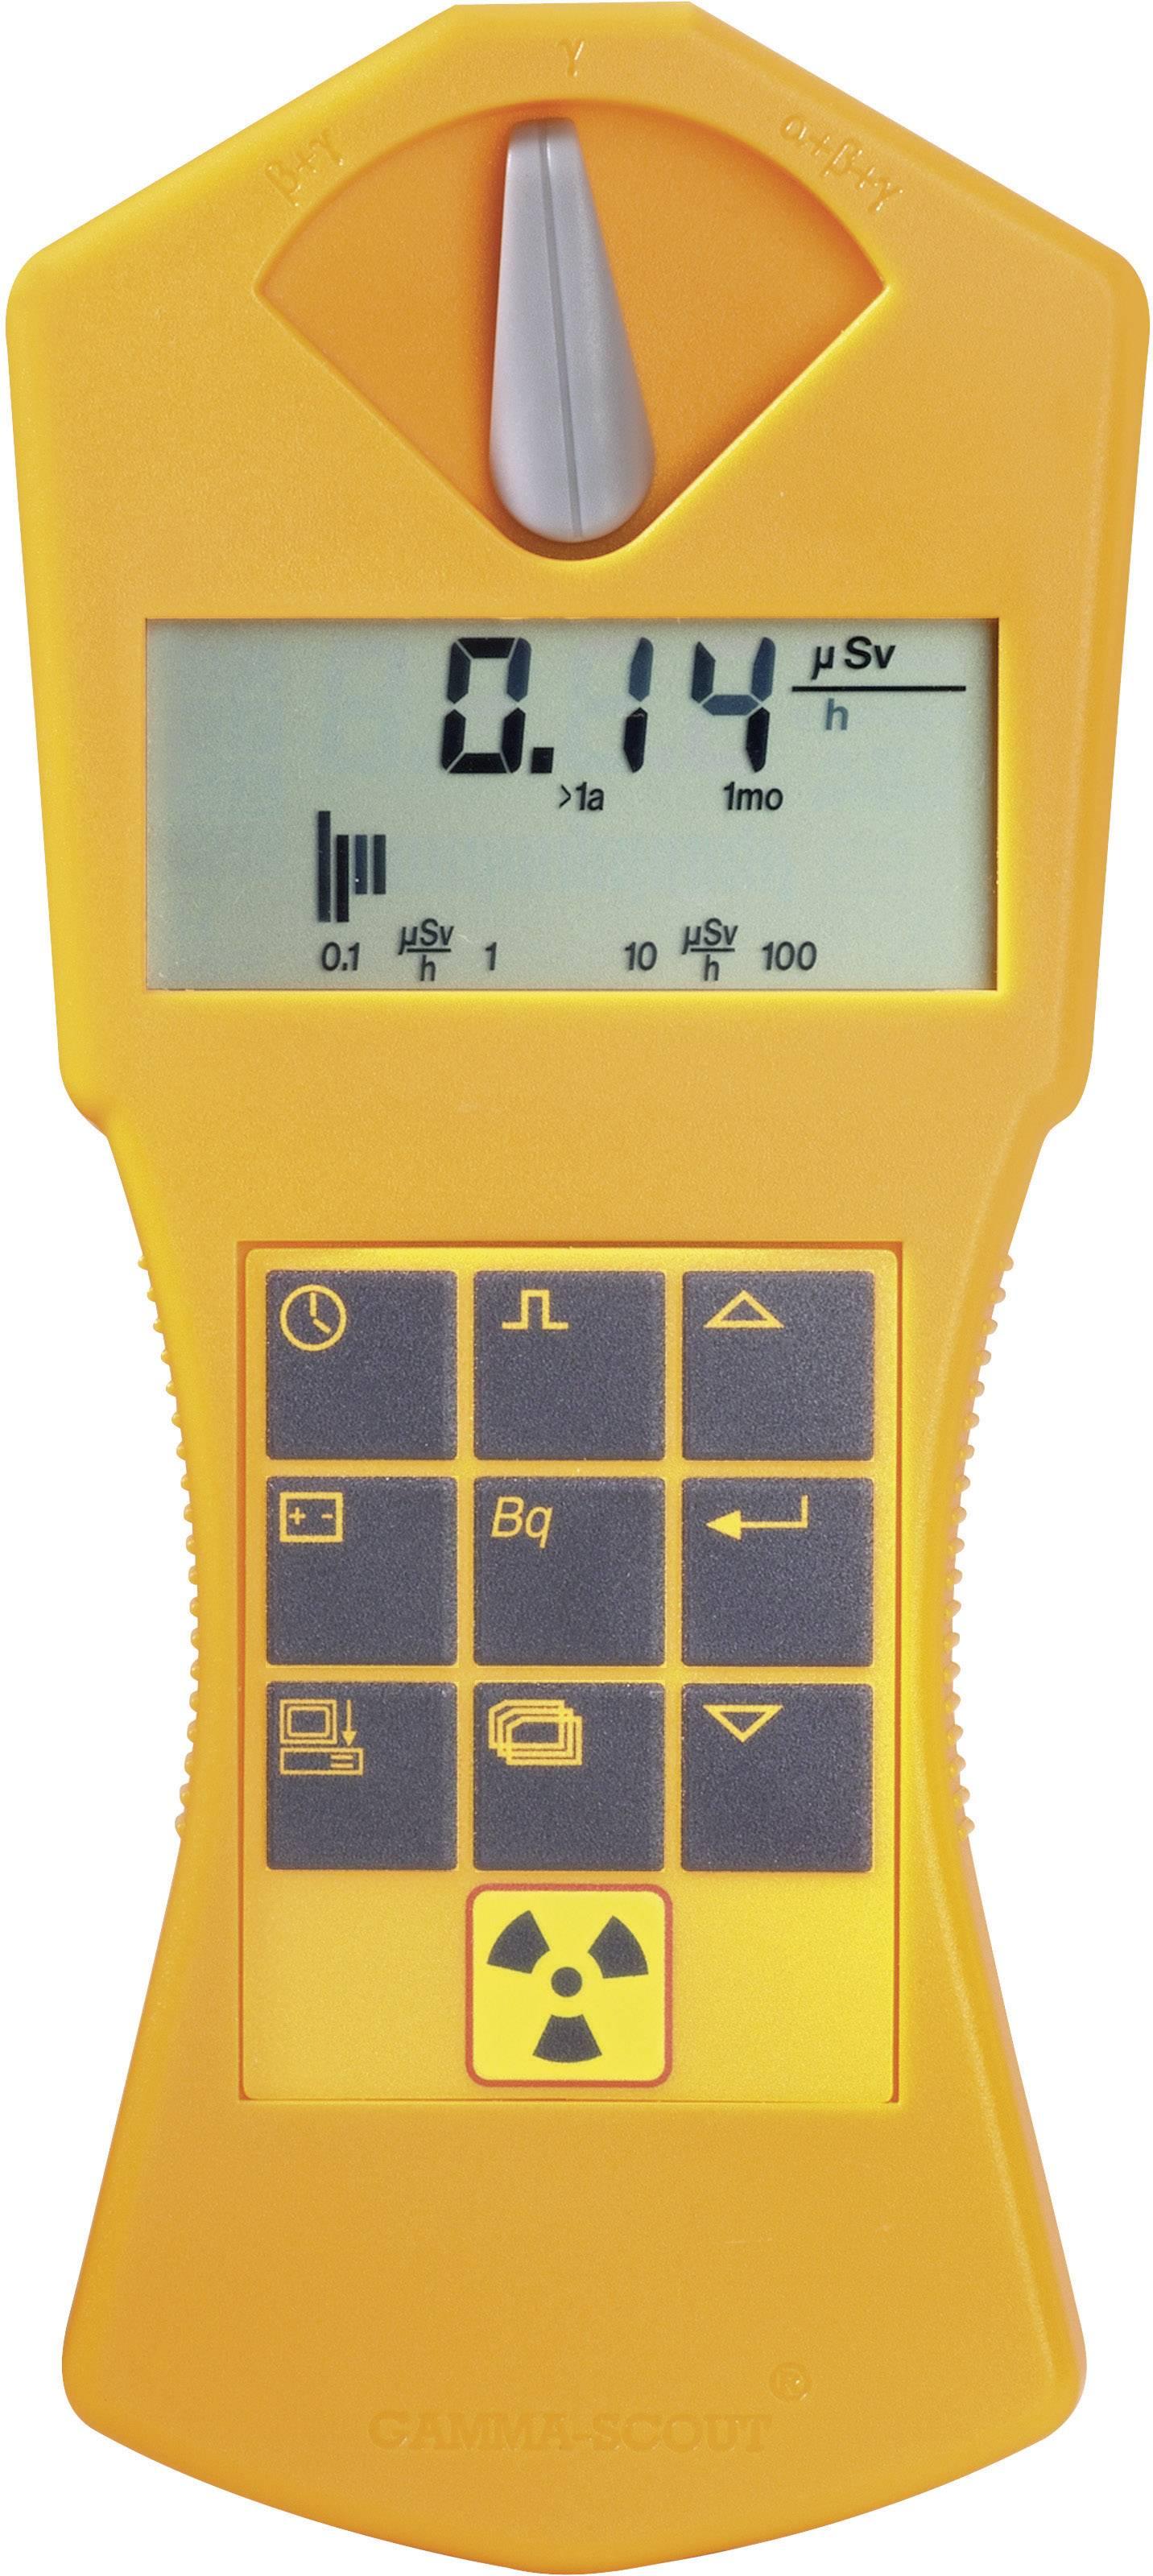 Geigerov čítač pre kontrolu rádioaktivity Gamma Scout Online